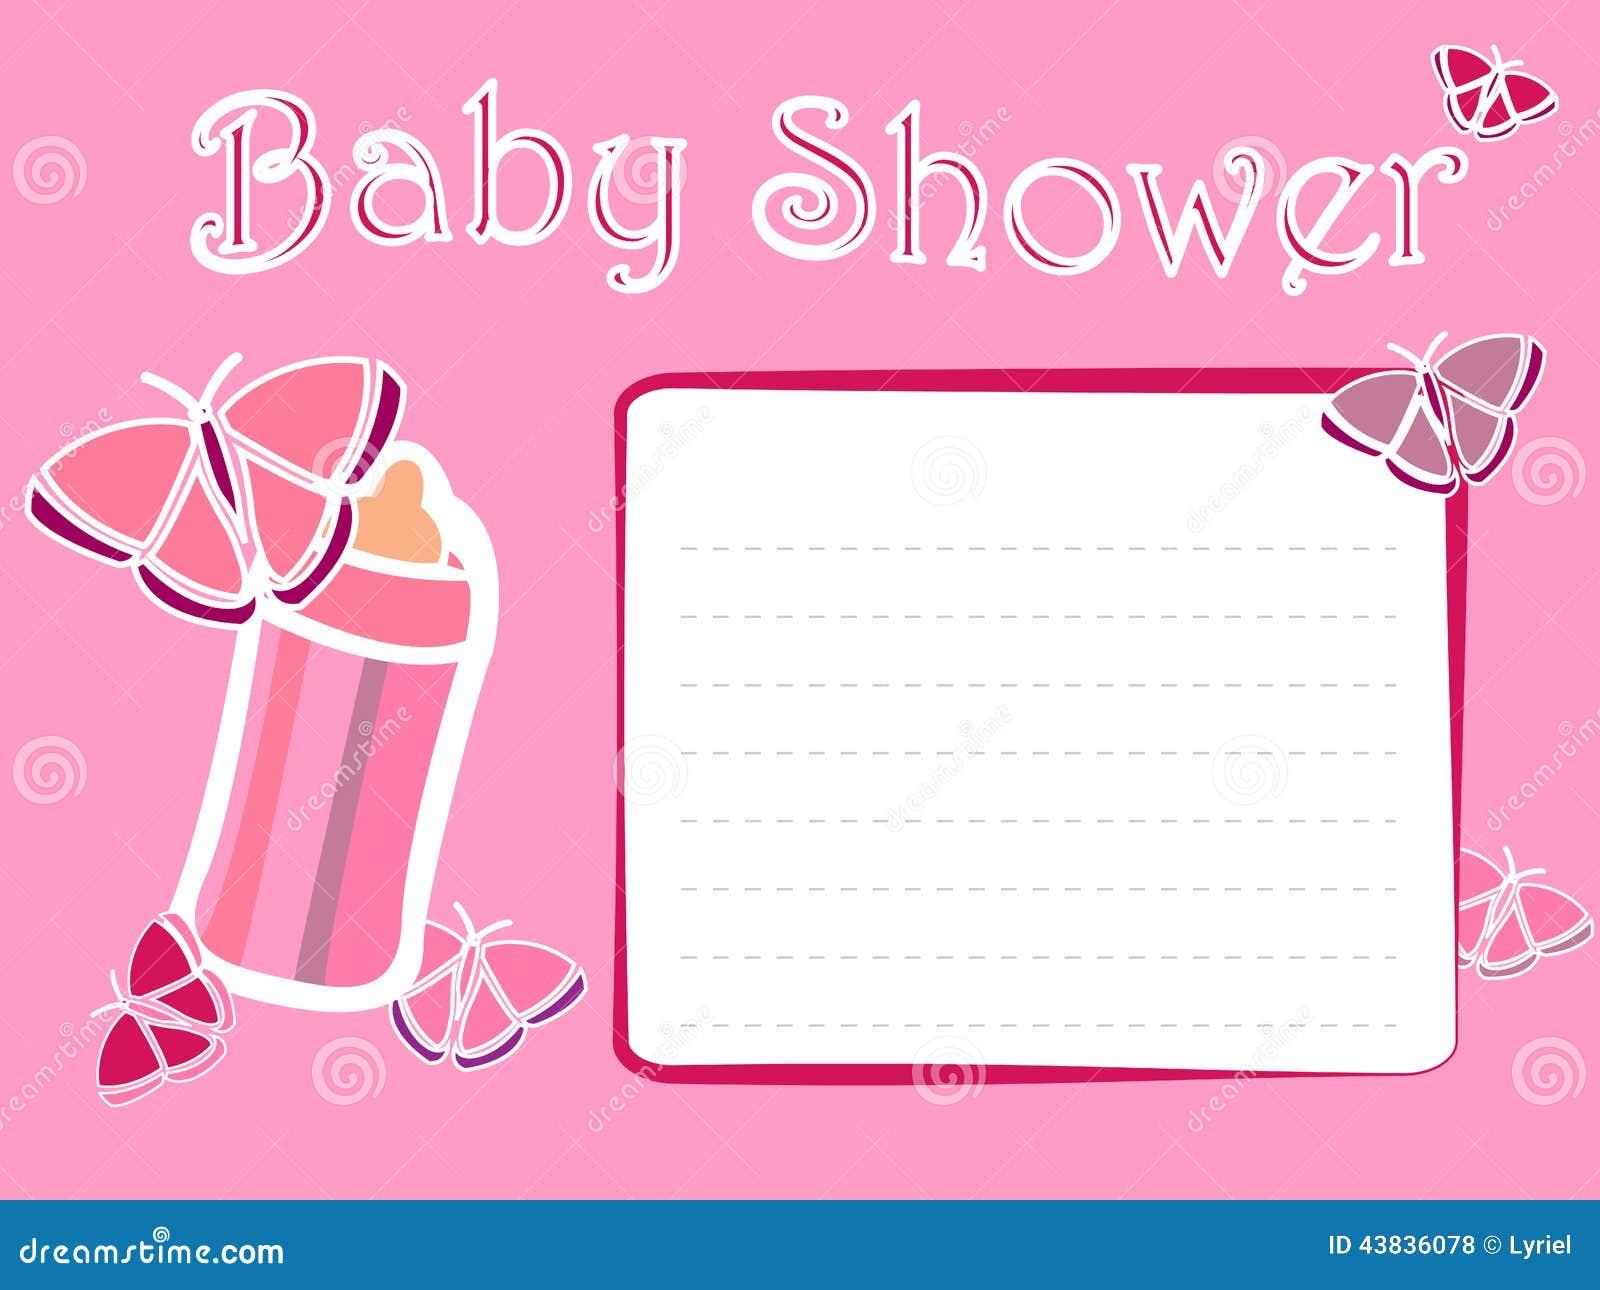 Tinkerbell Birthday Invitation Card - Free Printable Invitation ...